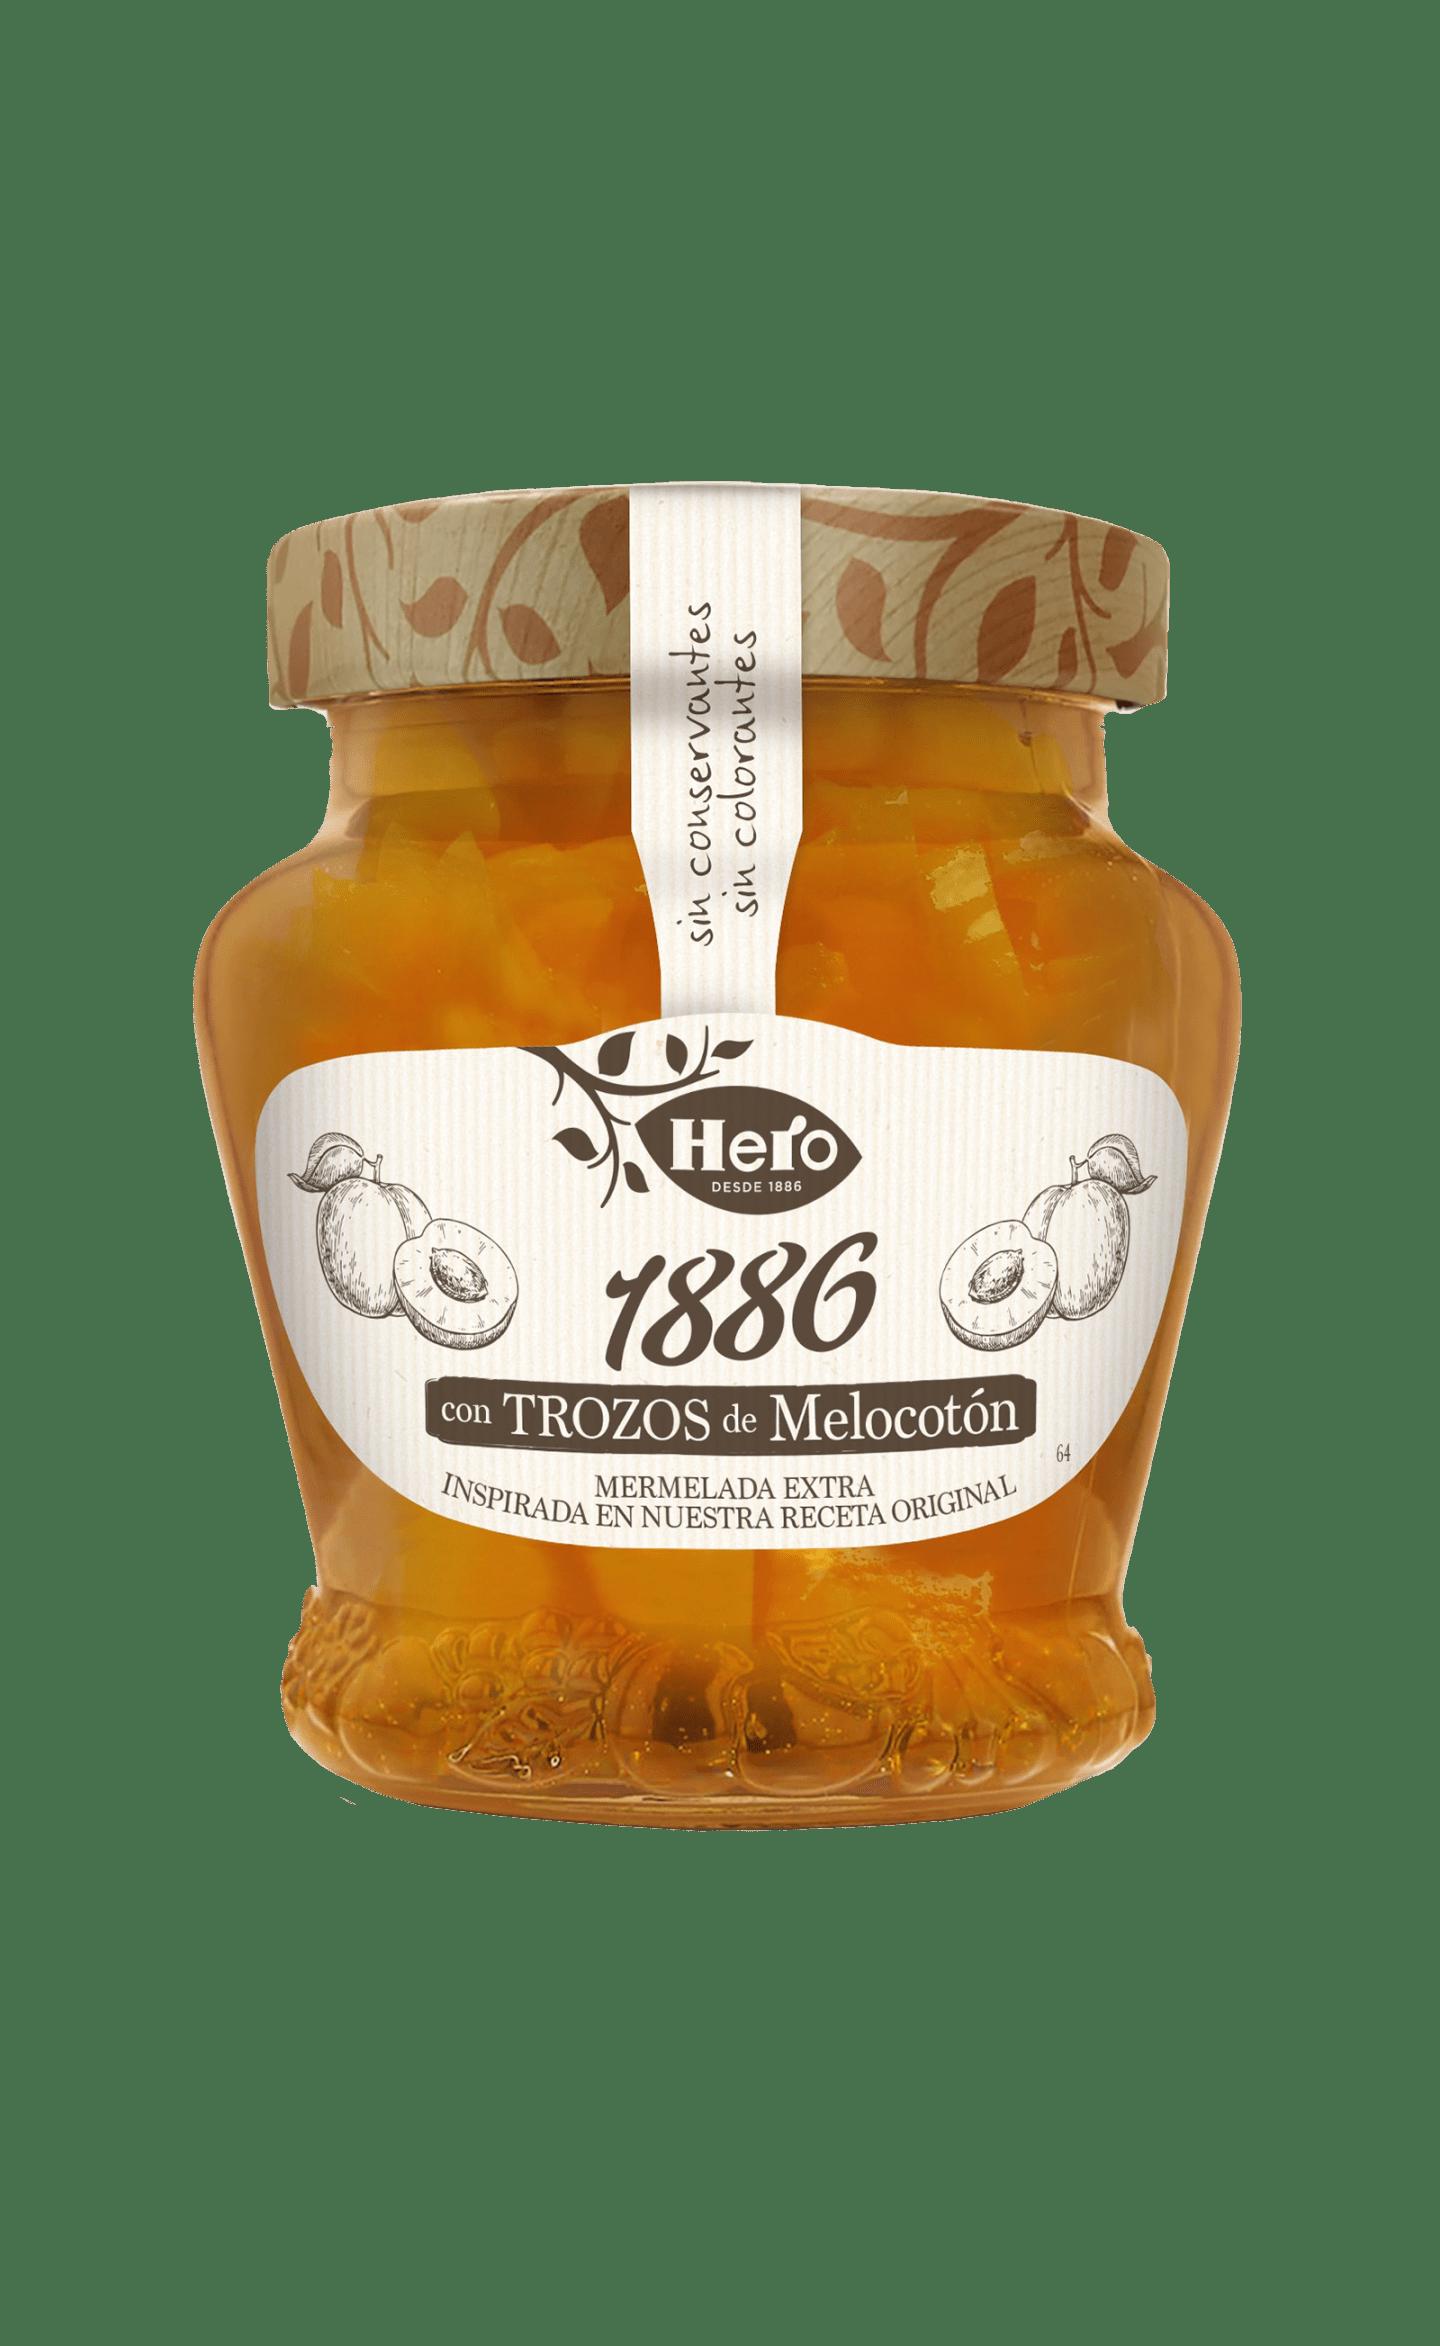 Mermelada 1886 de Melocotón con Trozos